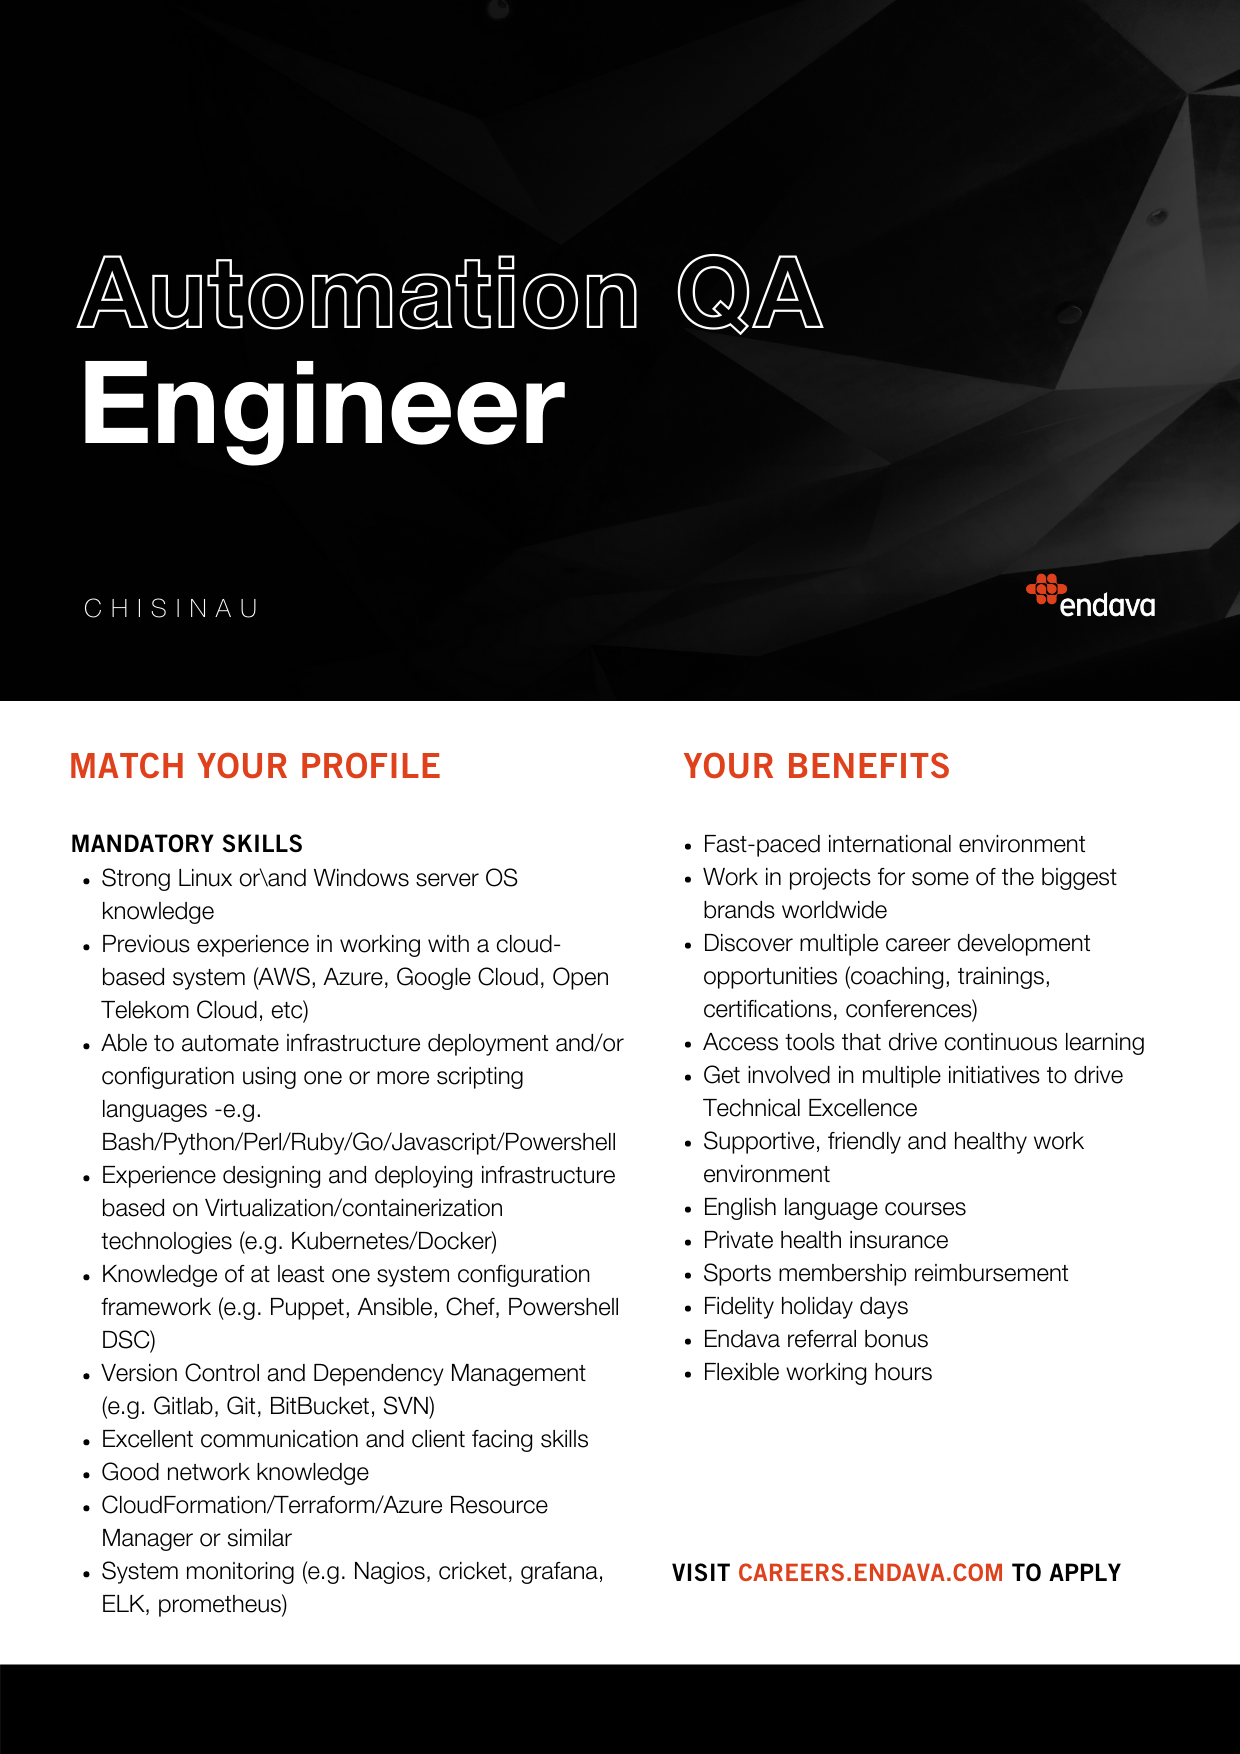 Automation QA Engineer